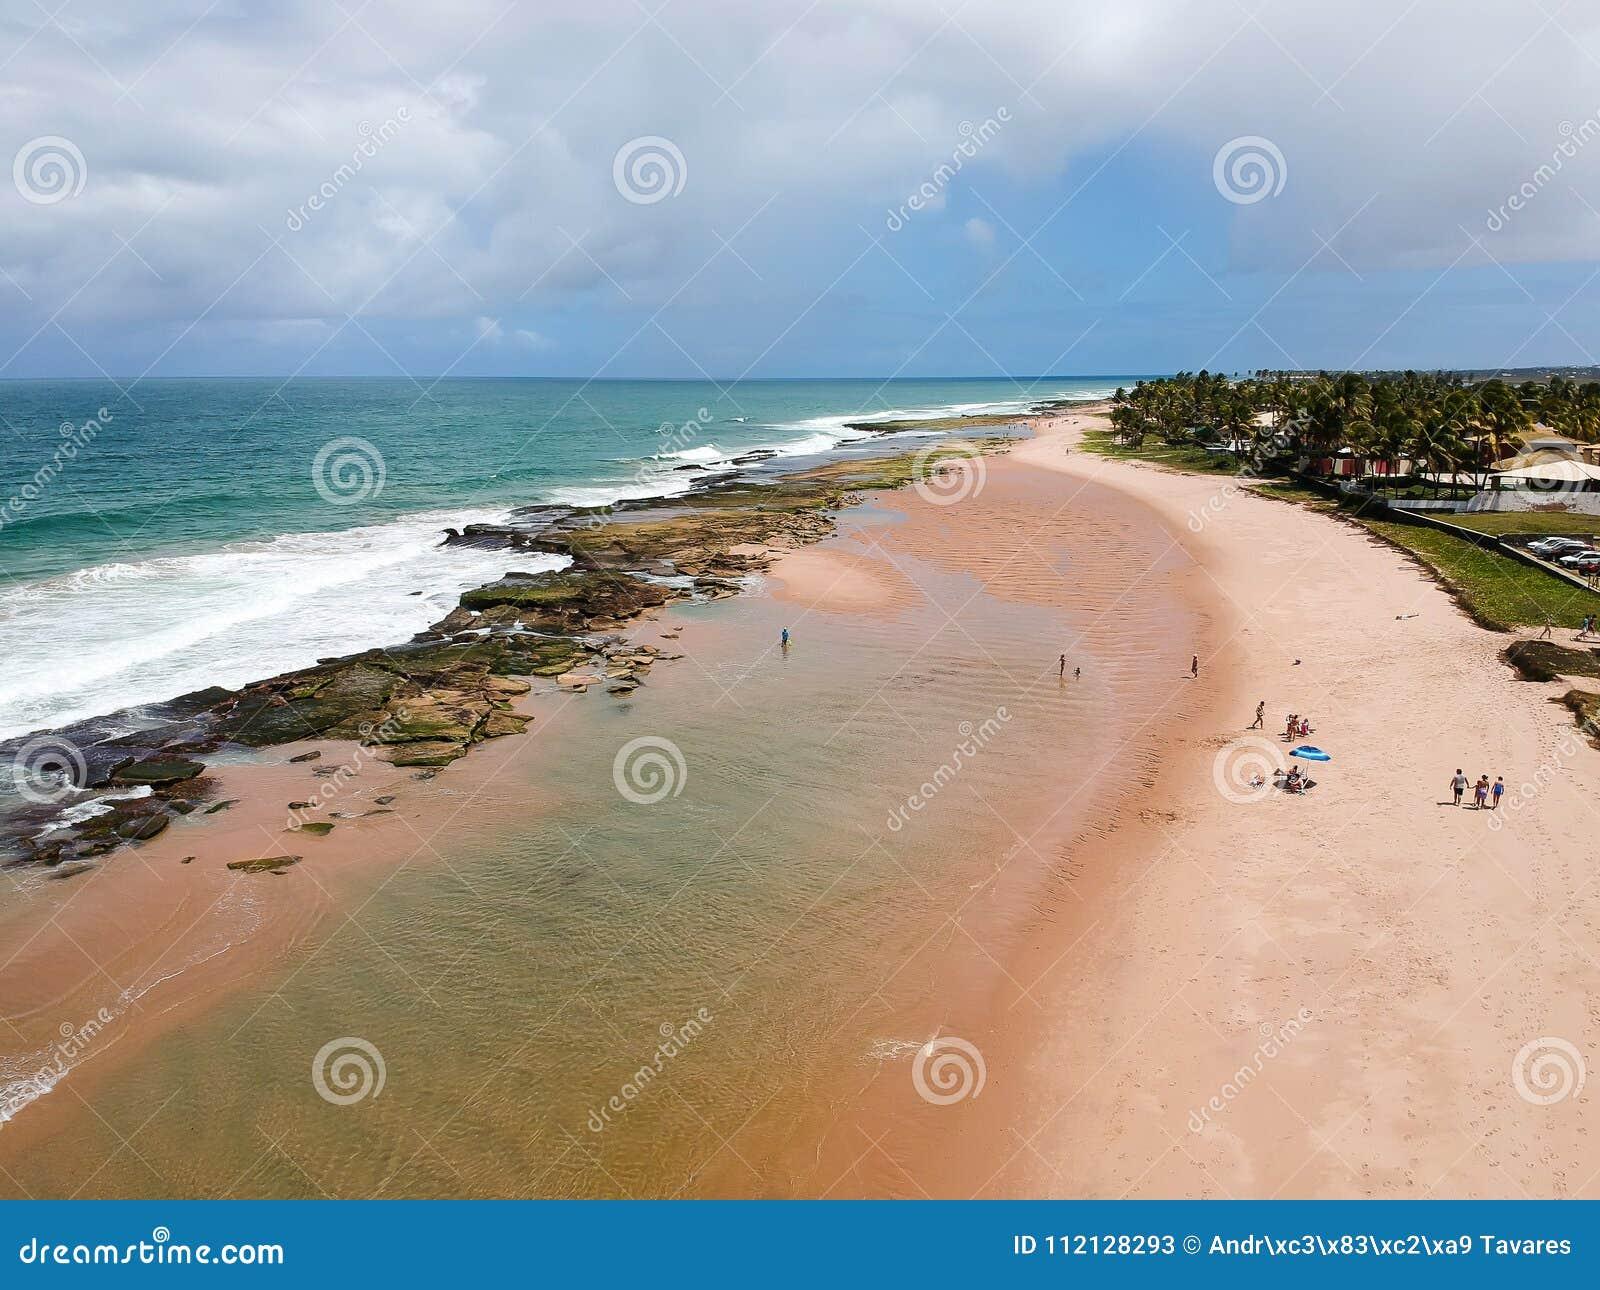 Drone view of Praia de Interlagos, Bahia, Brazil